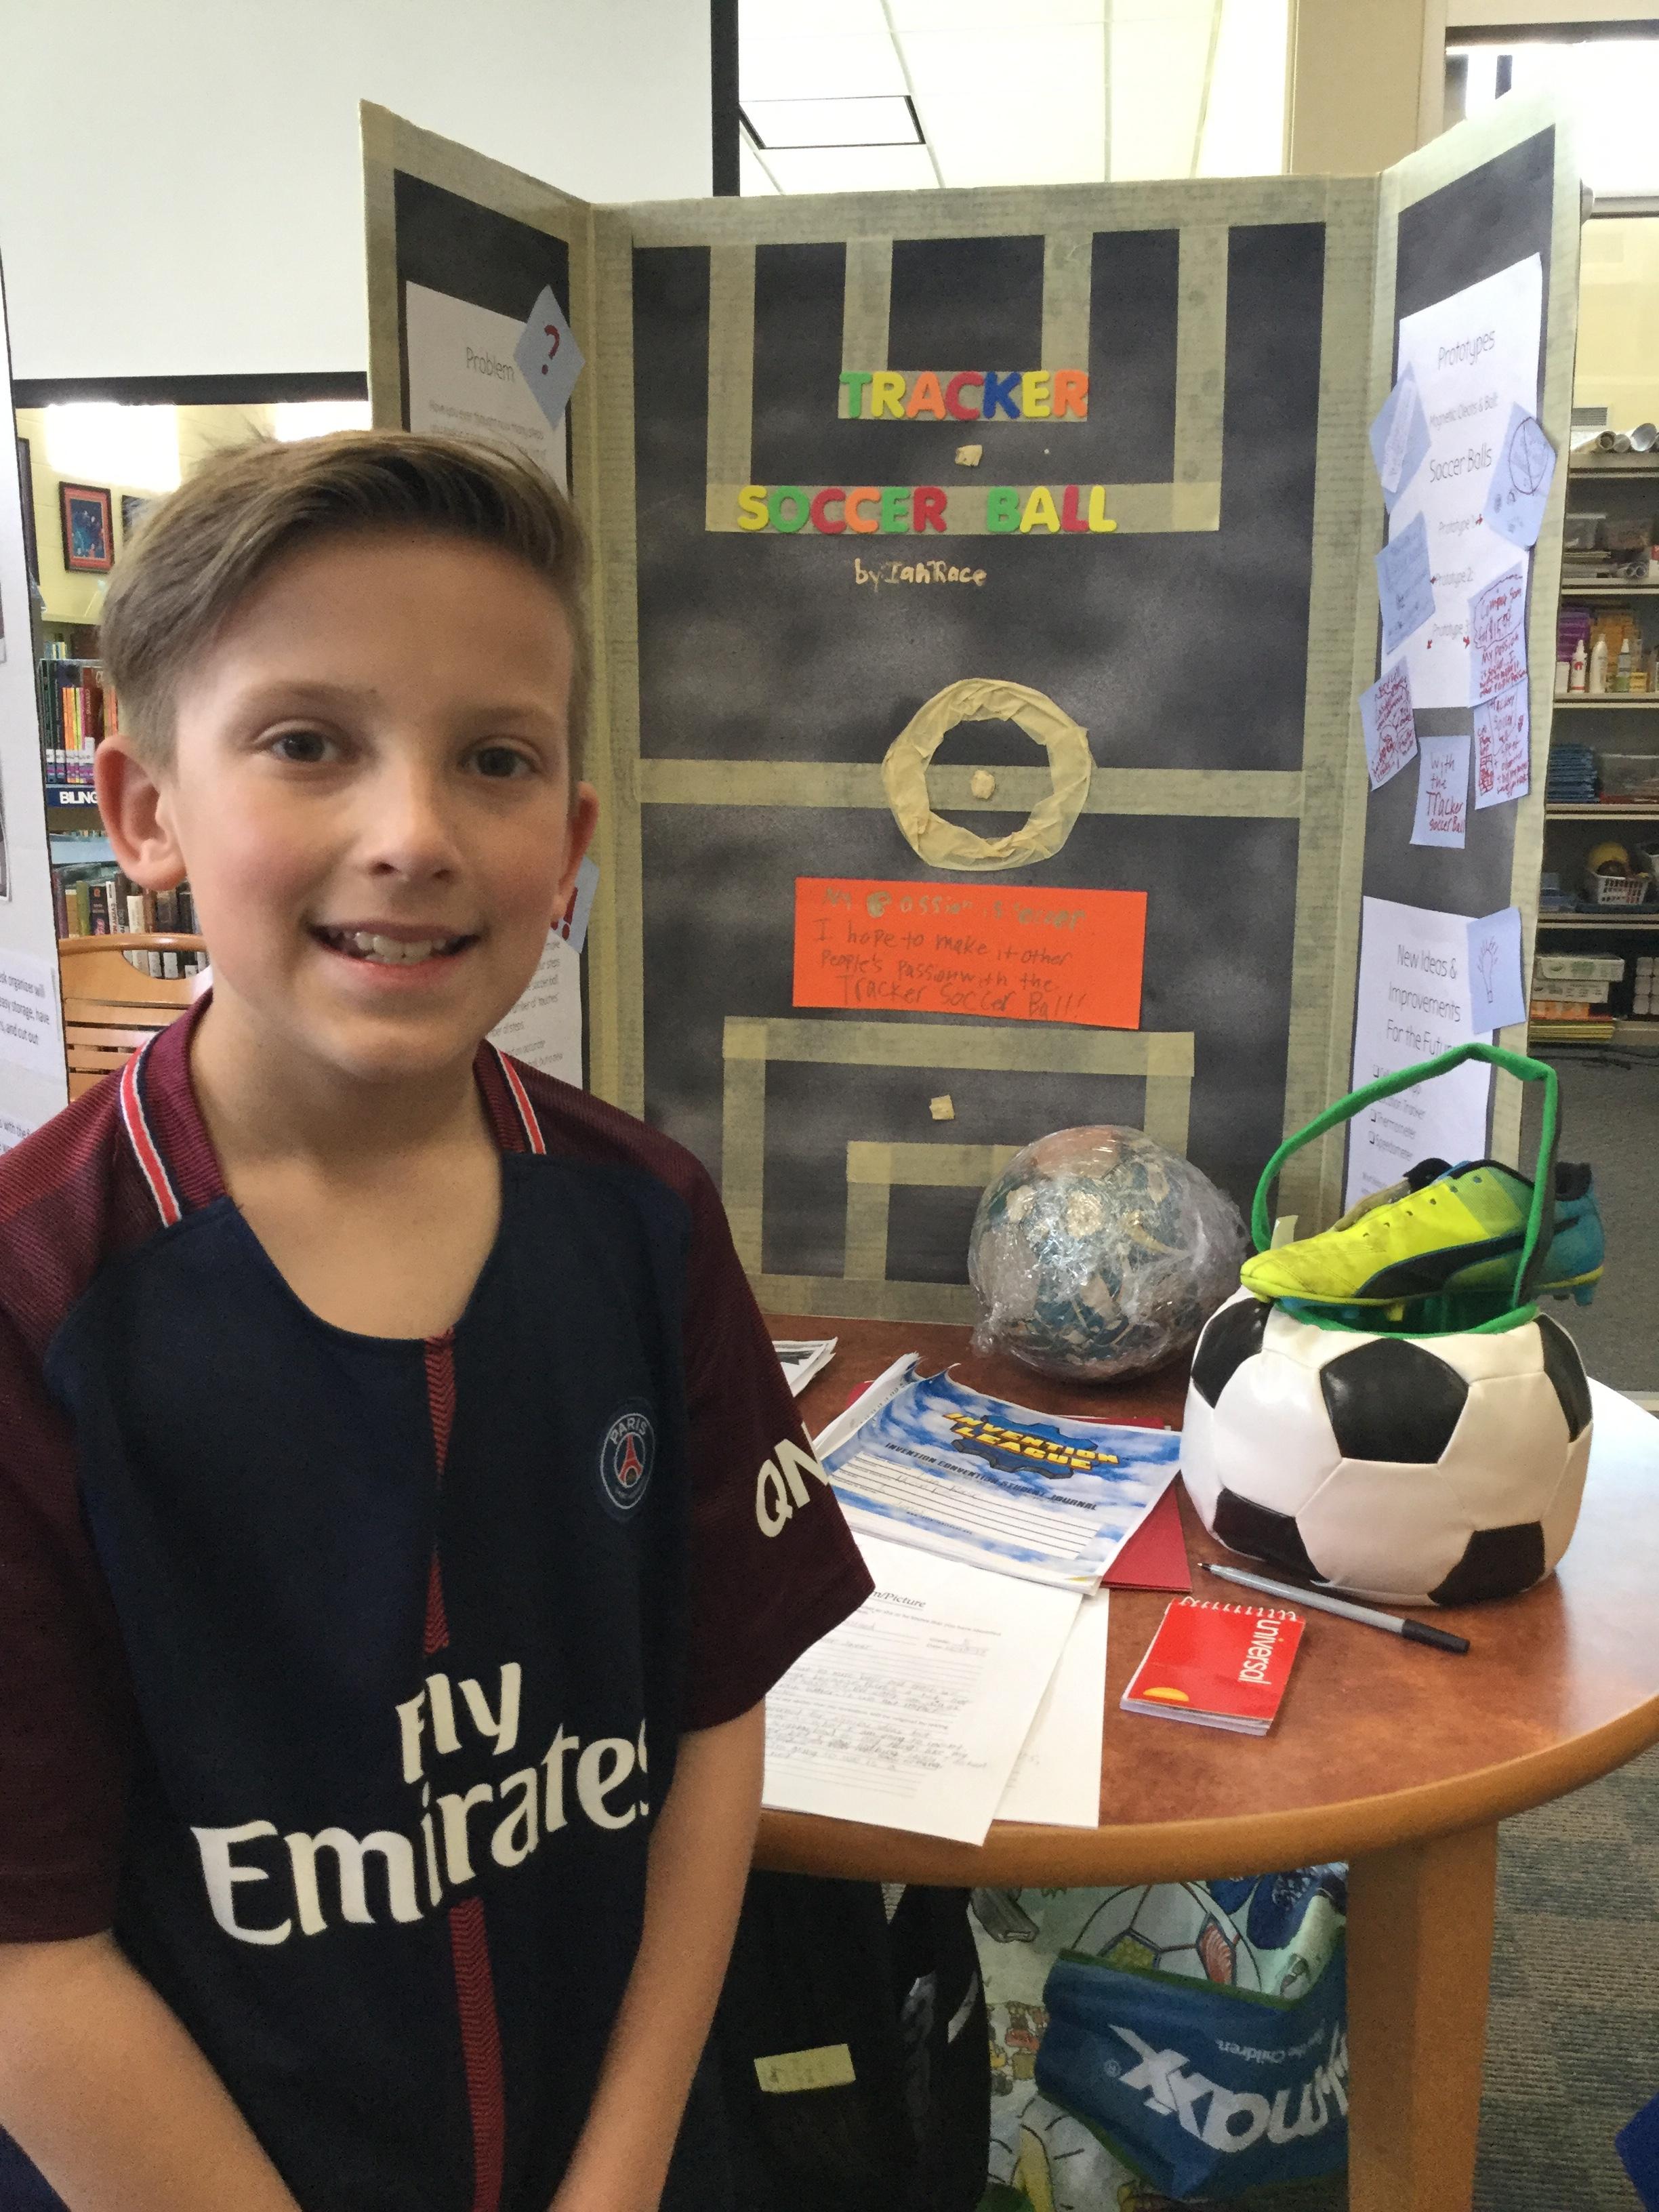 Ian Race and his soccer ball tracker.